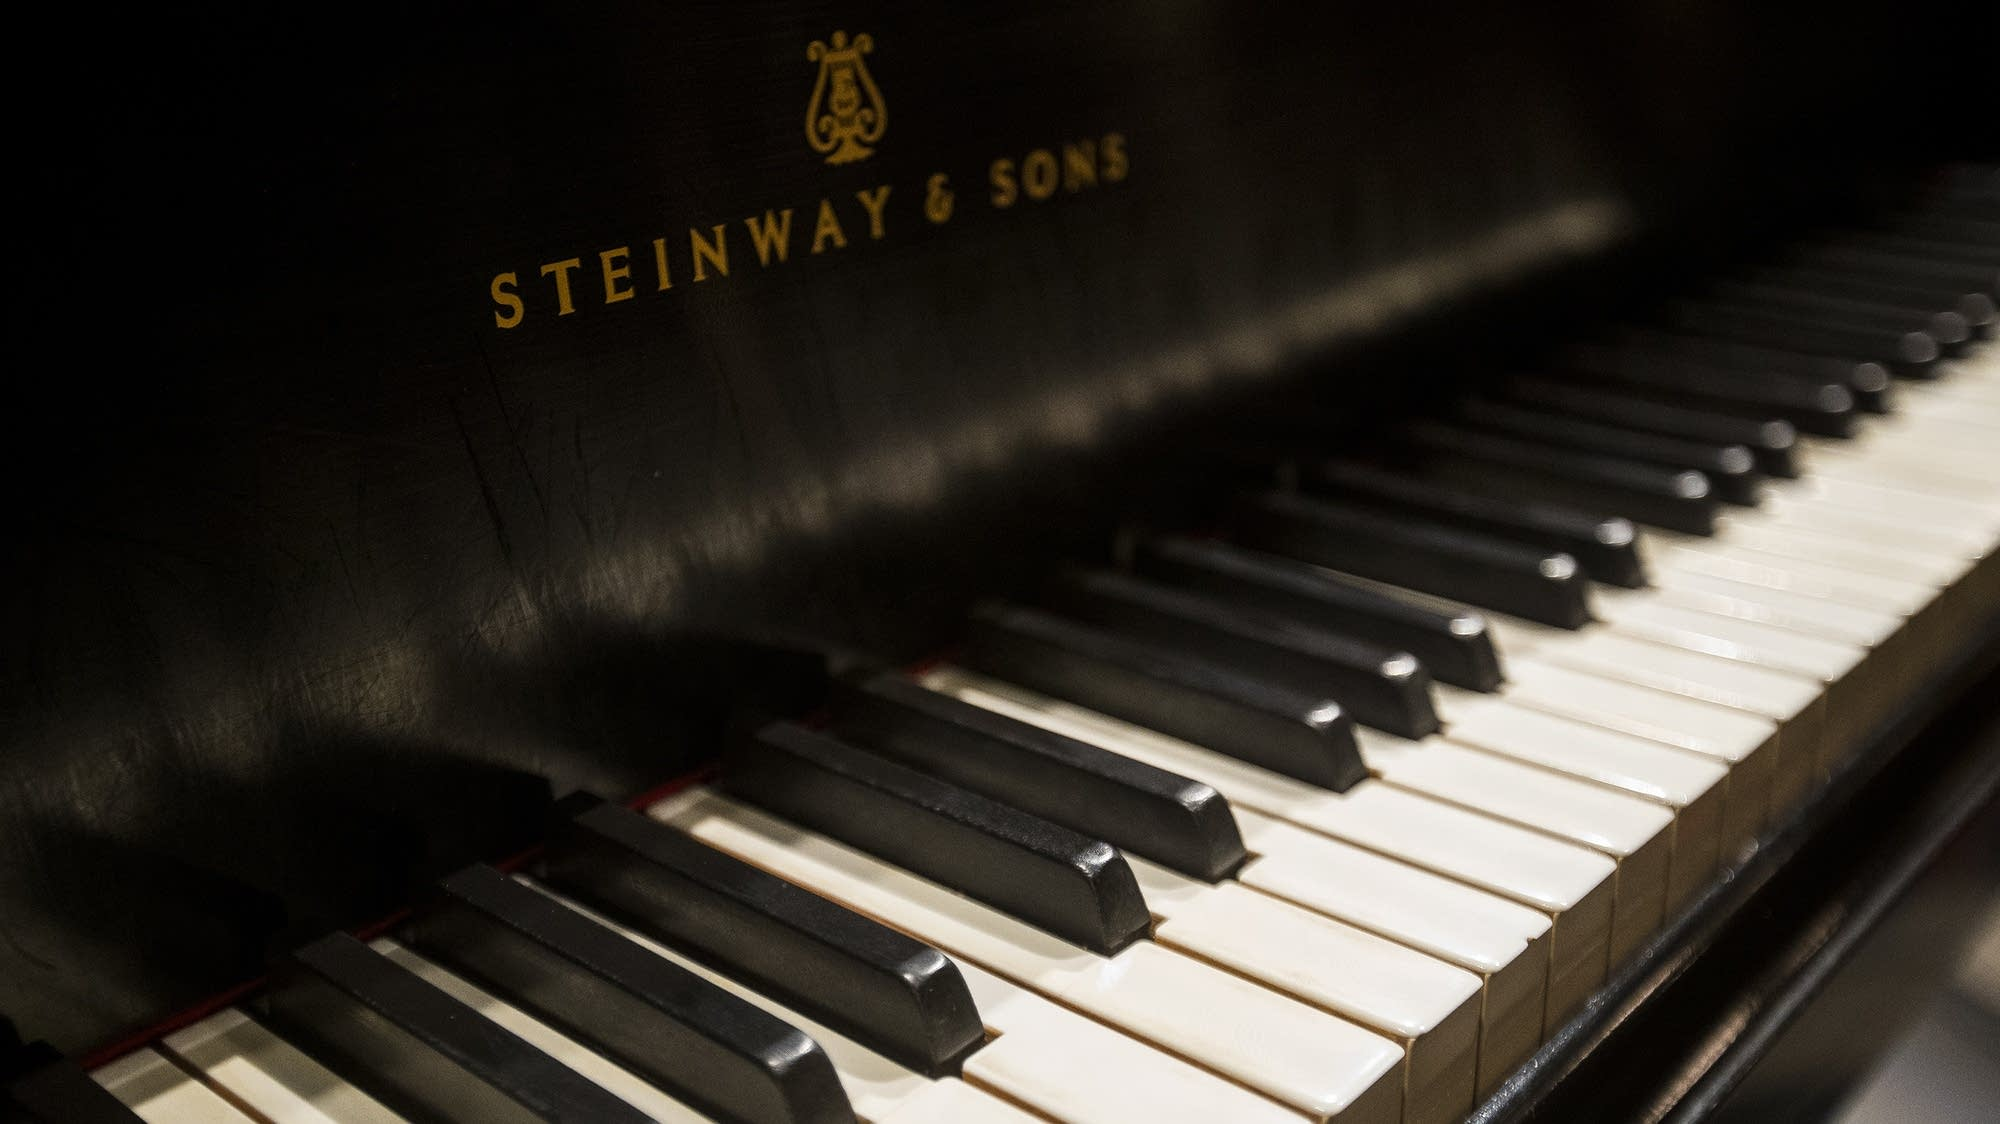 Hibbing High School's Steinway piano